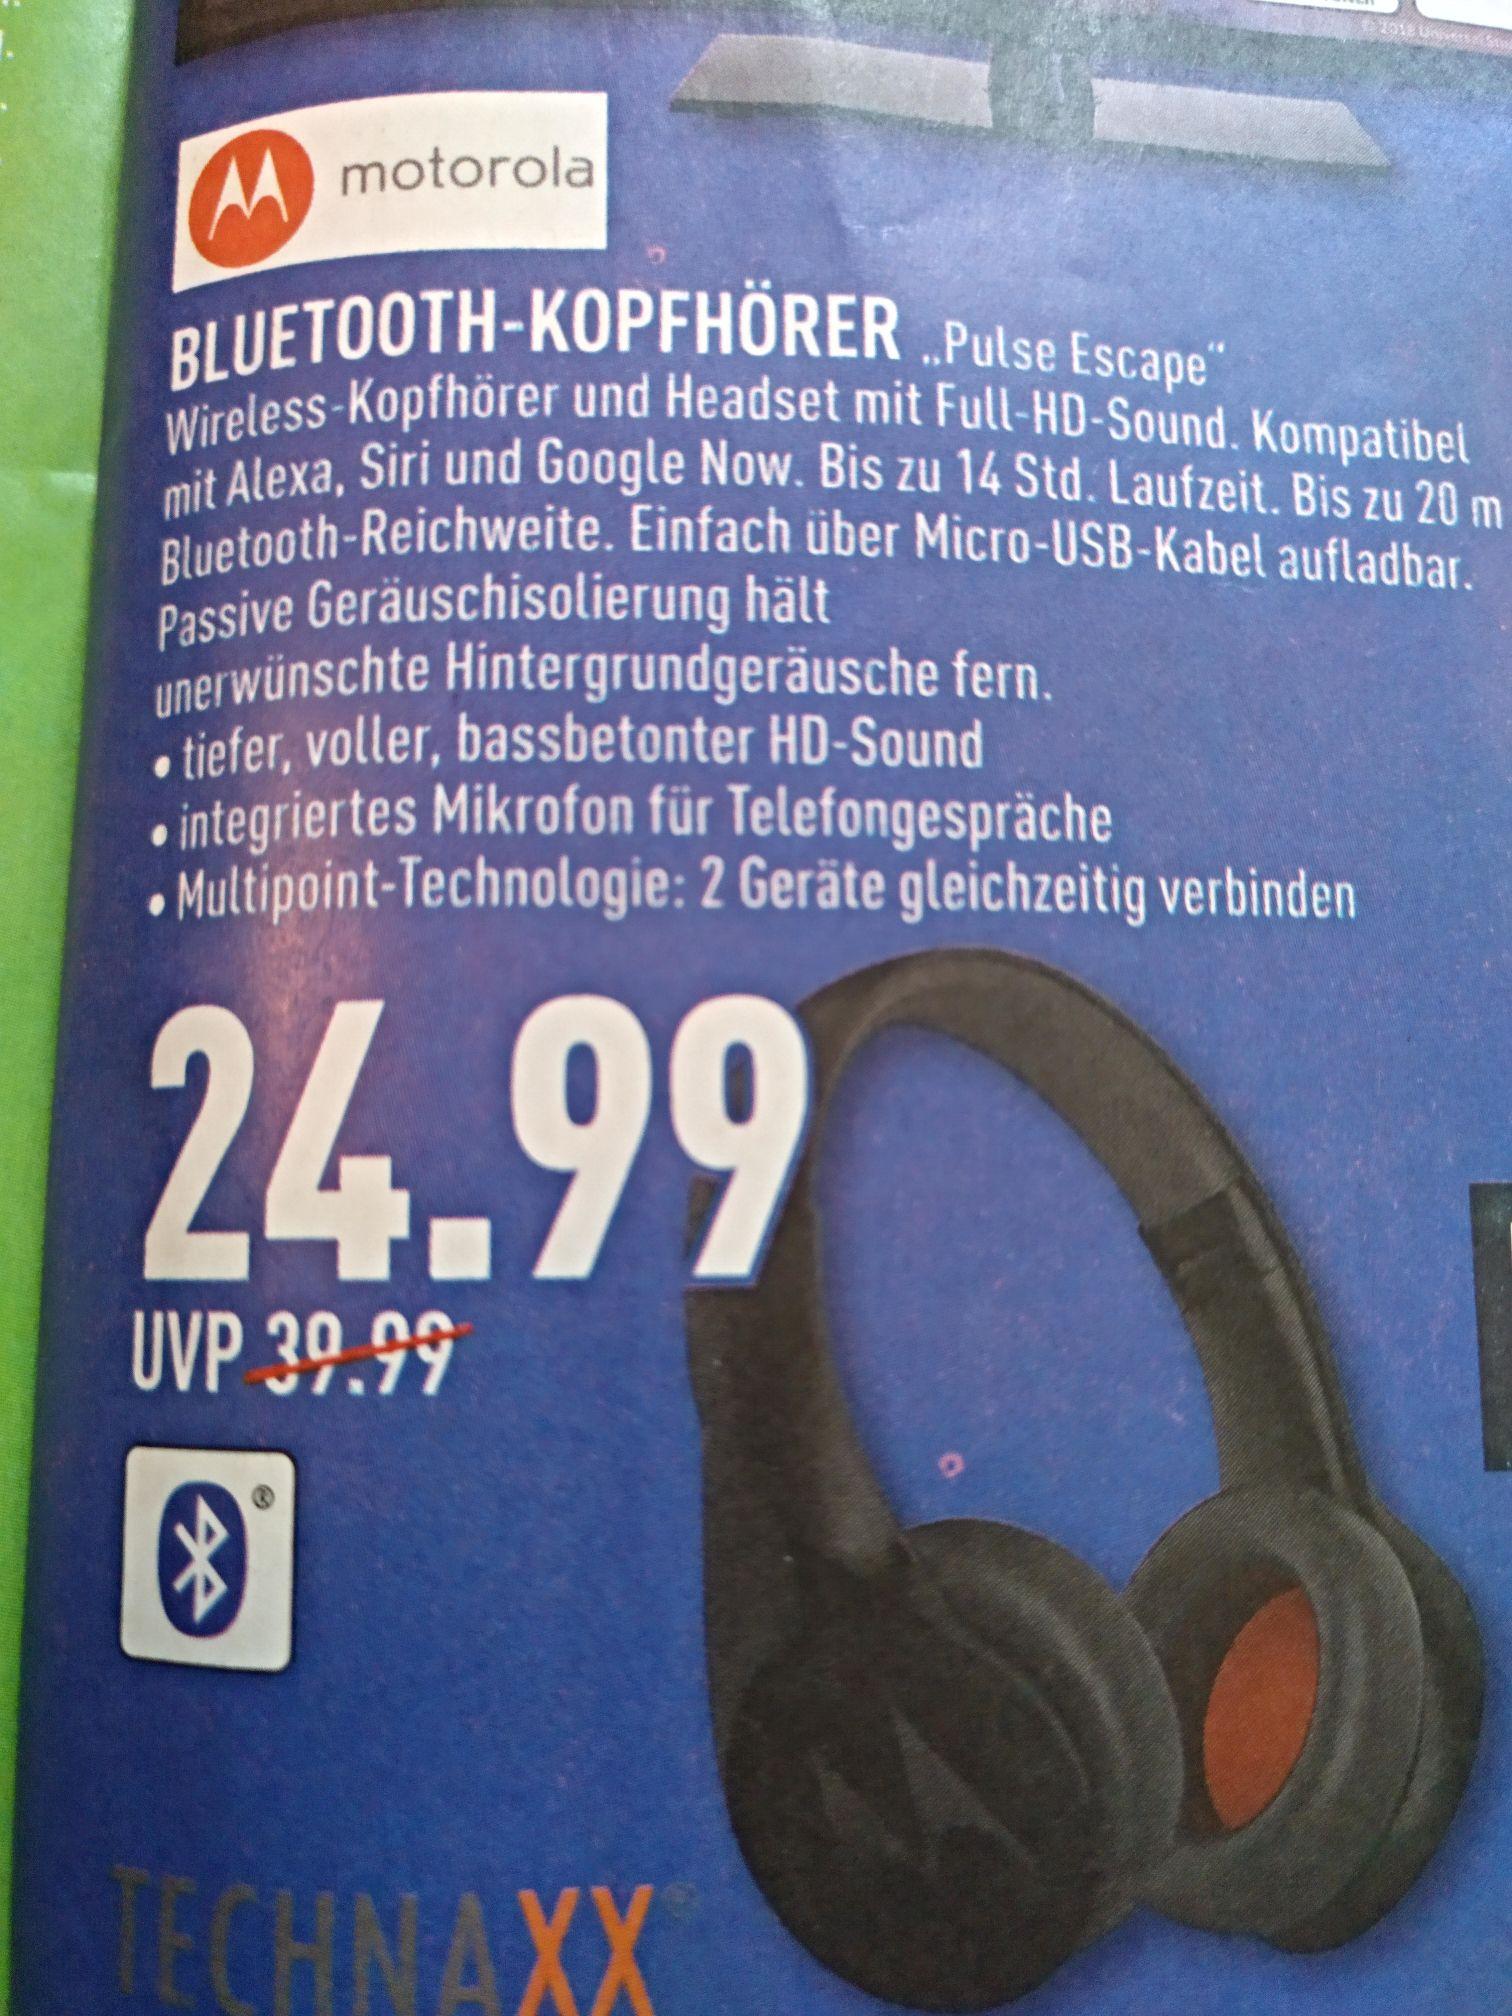 "Motorola BT-Kopfhörer ""Pulse Escape"" - Kompatibel mit Alexa, Siri und Google Now - [Marktkauf] evtl. lokal (Büren)"